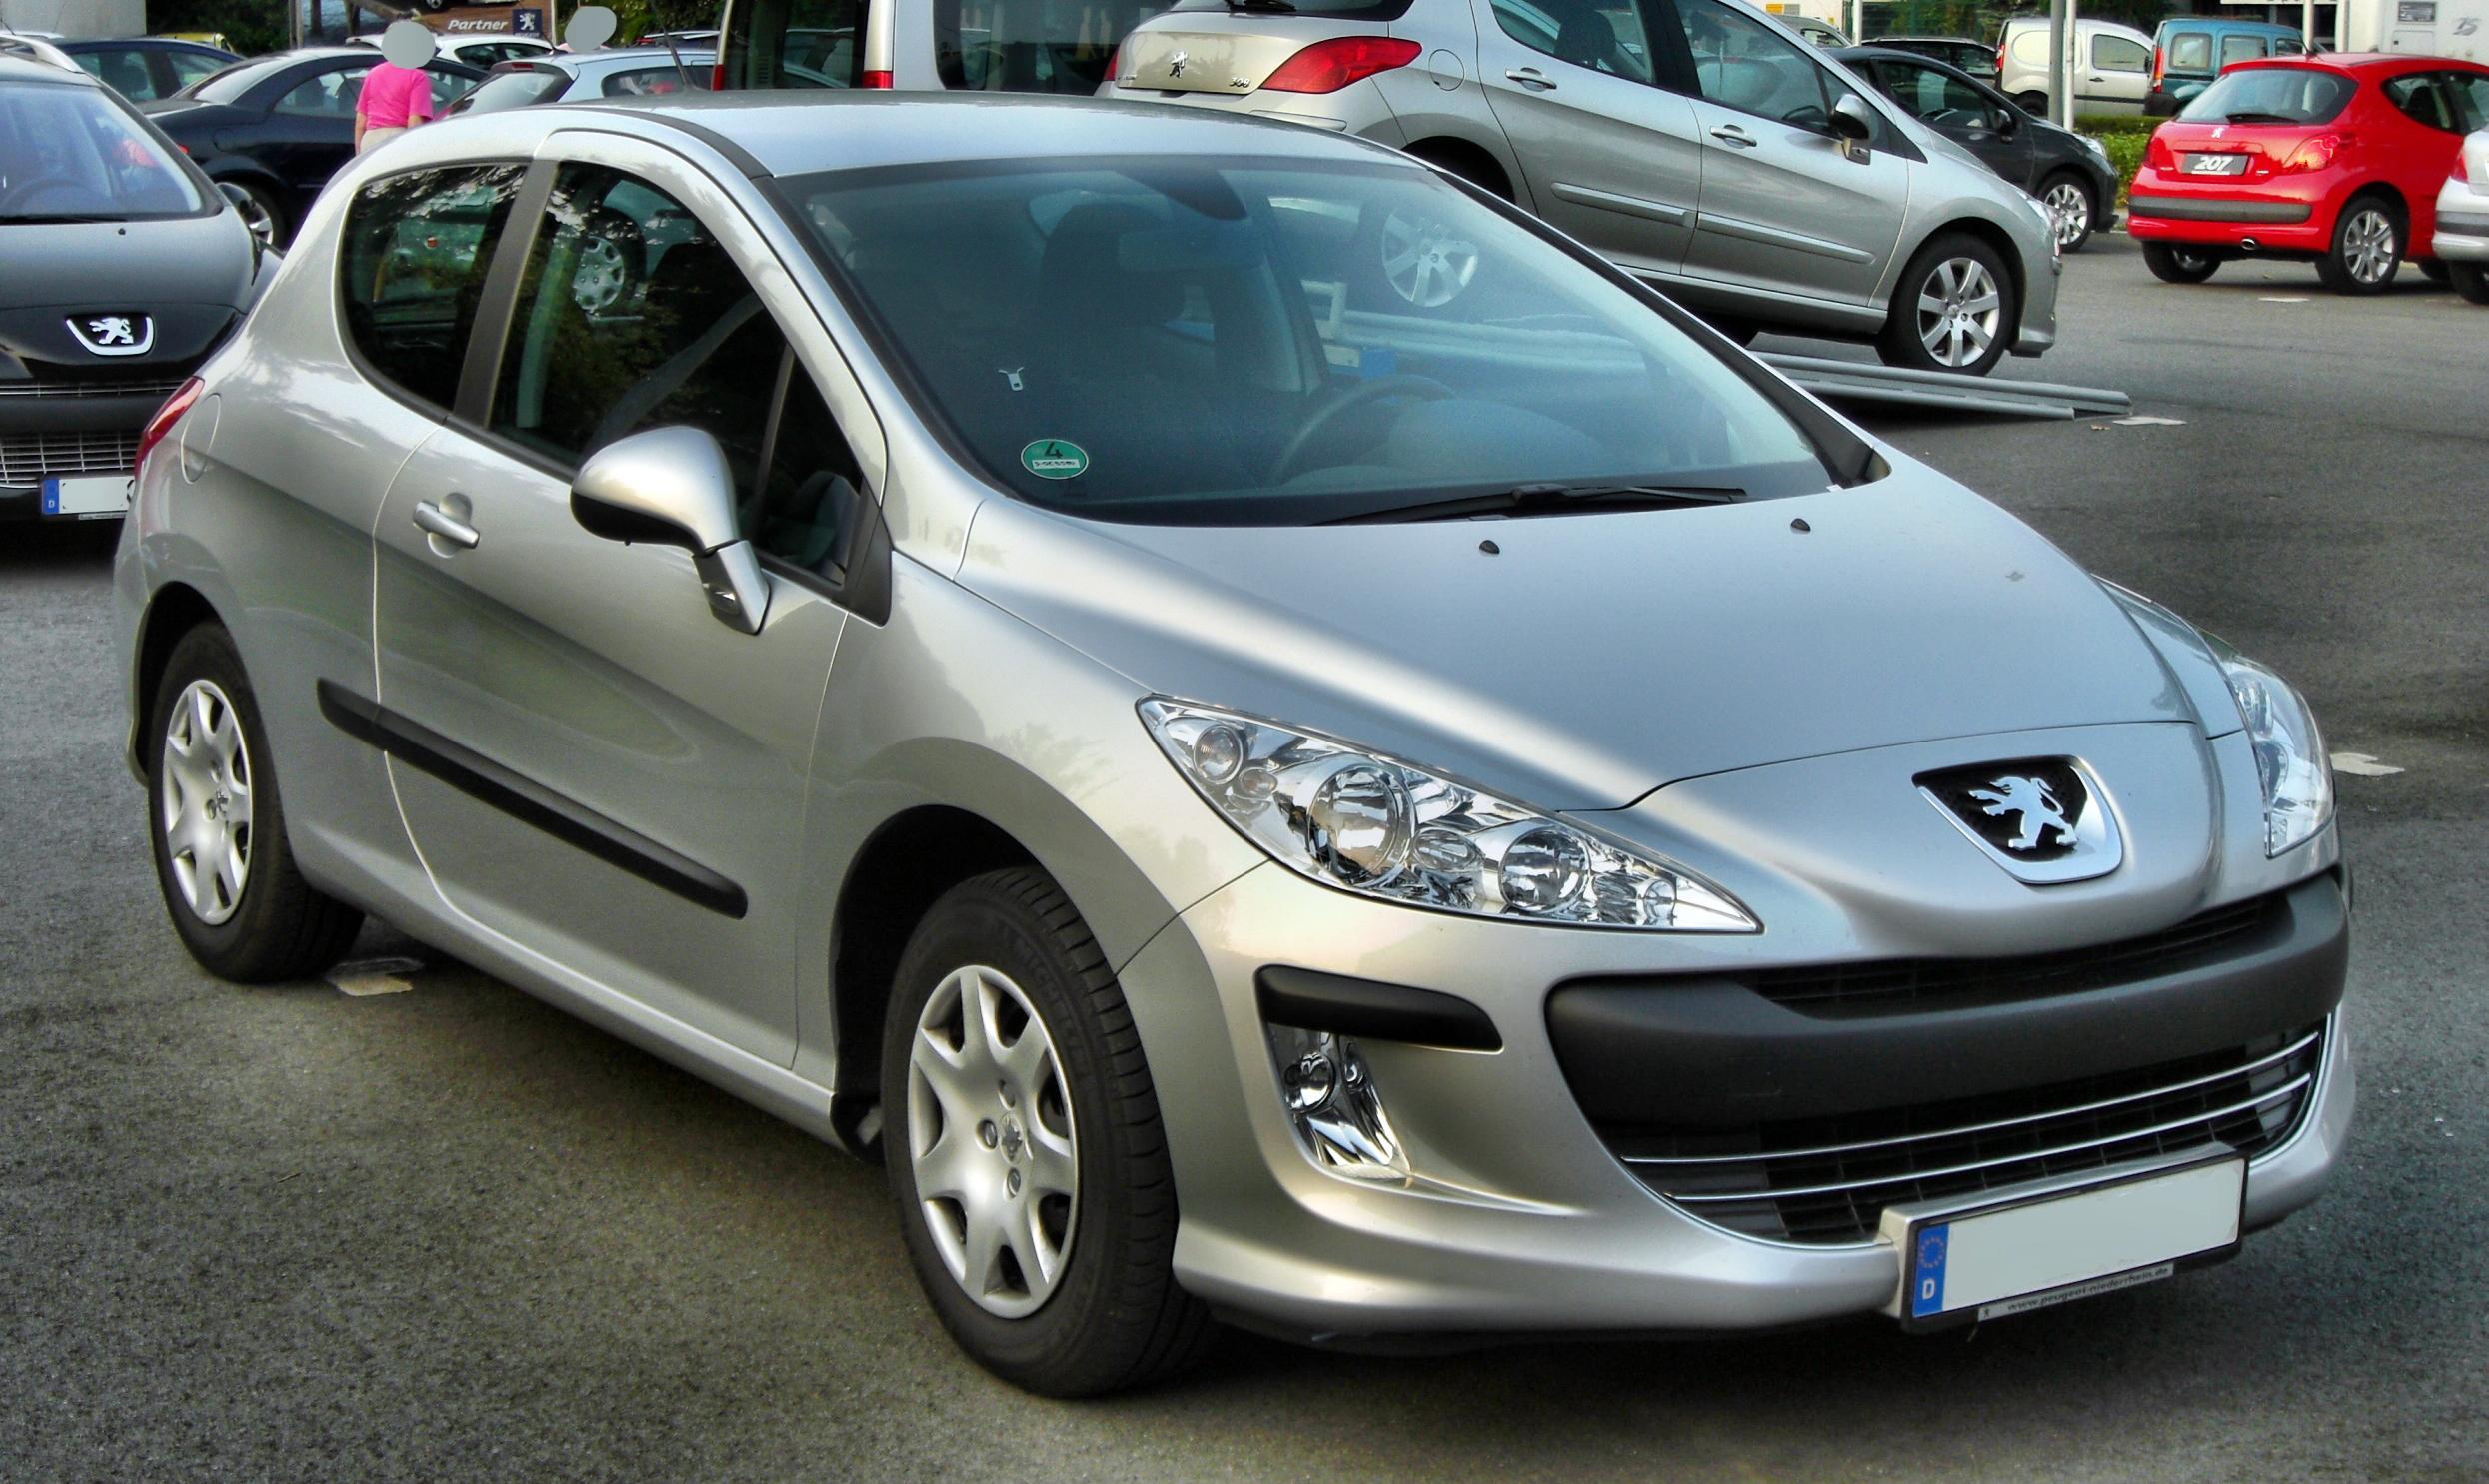 Build Your Own Car >> File:Peugeot 308 3-Türer front-1.JPG - Wikimedia Commons